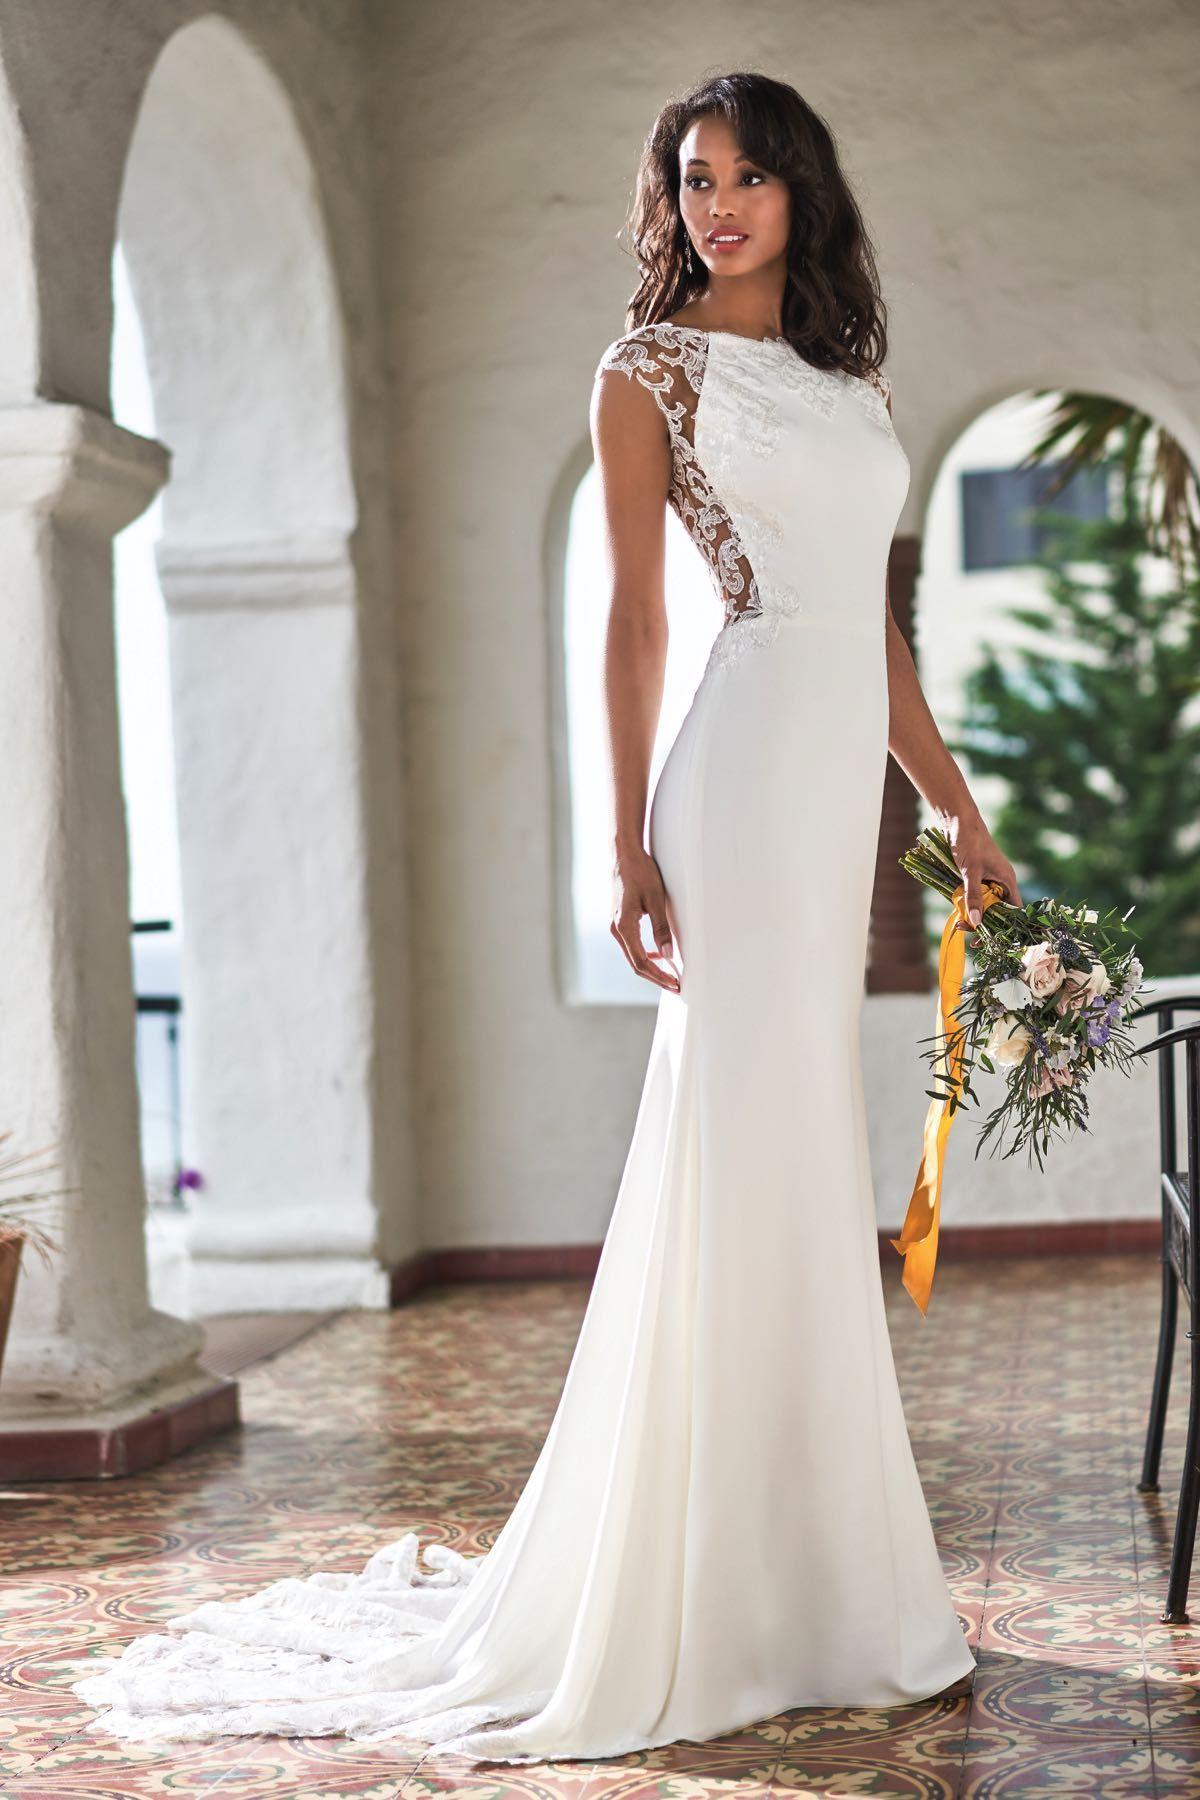 T212052 Romantic Sequin Lace & Stretch Crepe Wedding Dress